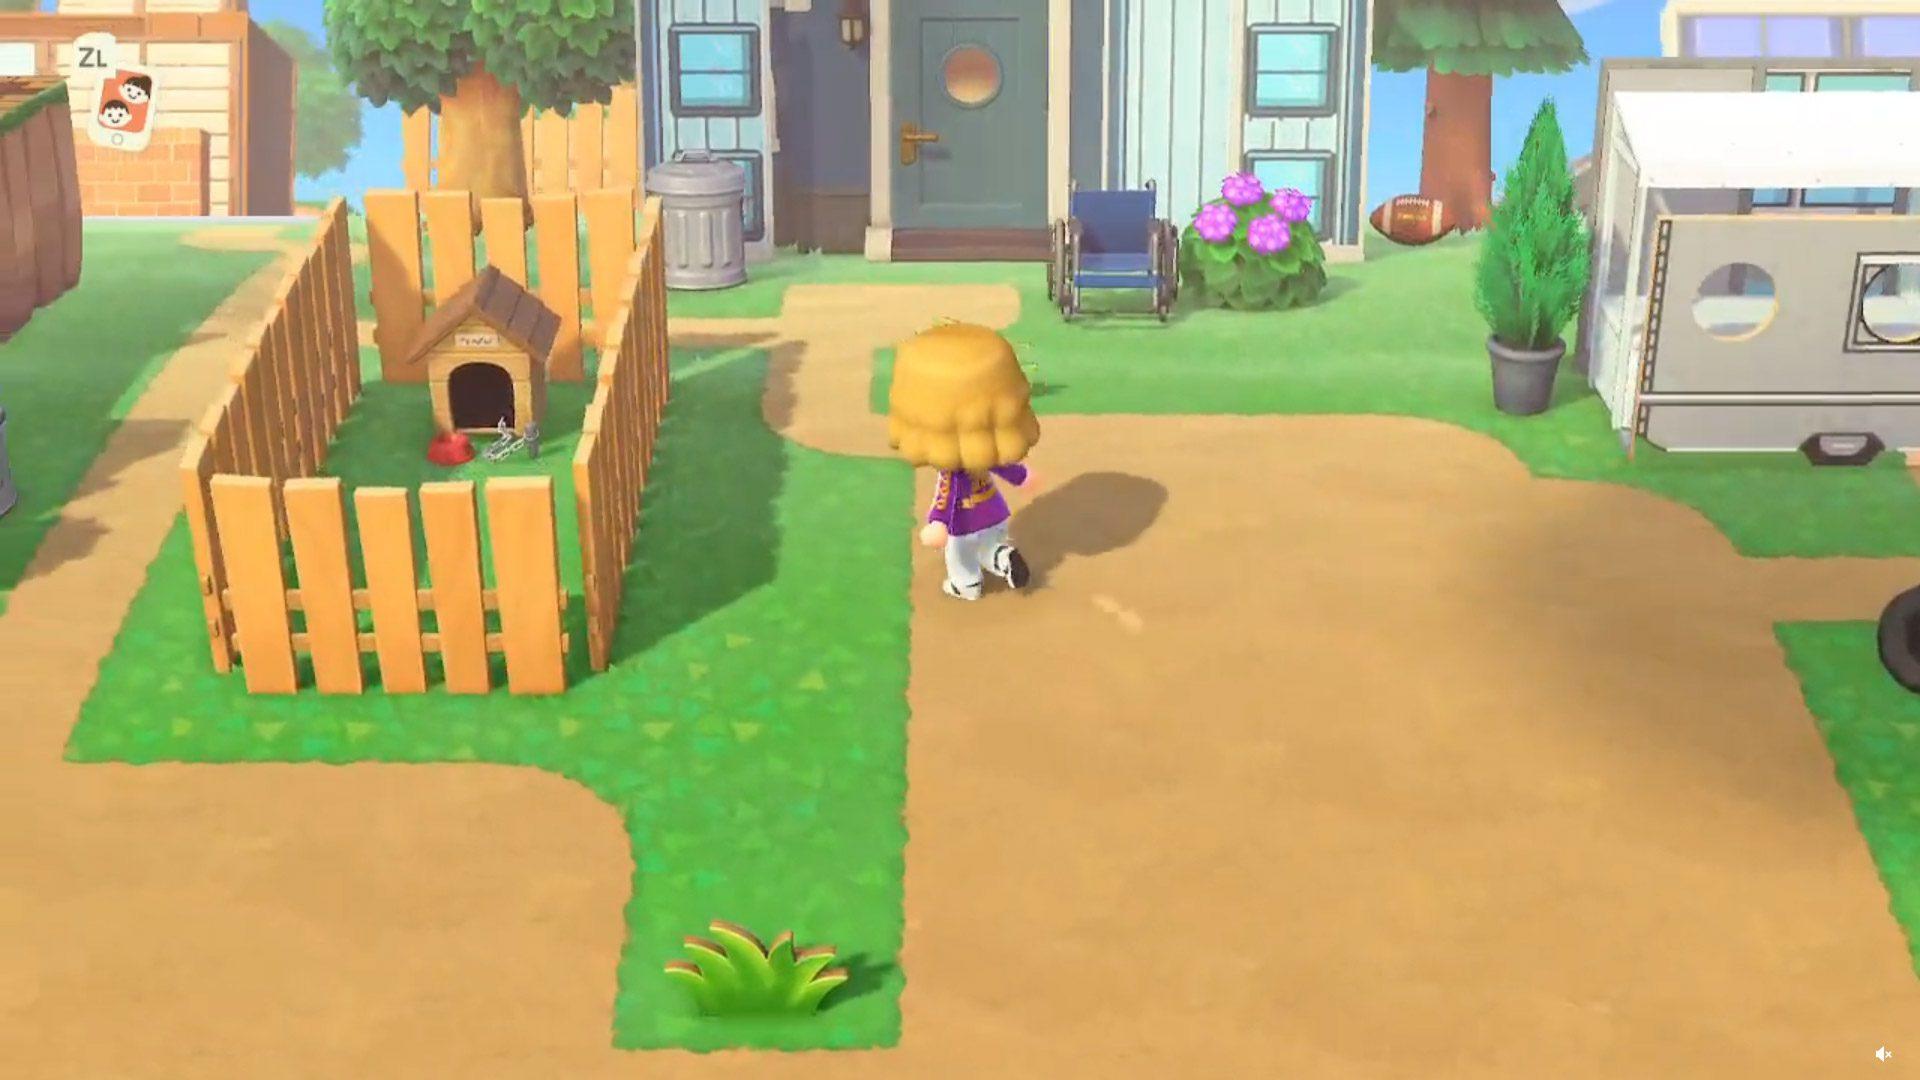 Pelican Town recreated in Animal Crossing: New Horizons